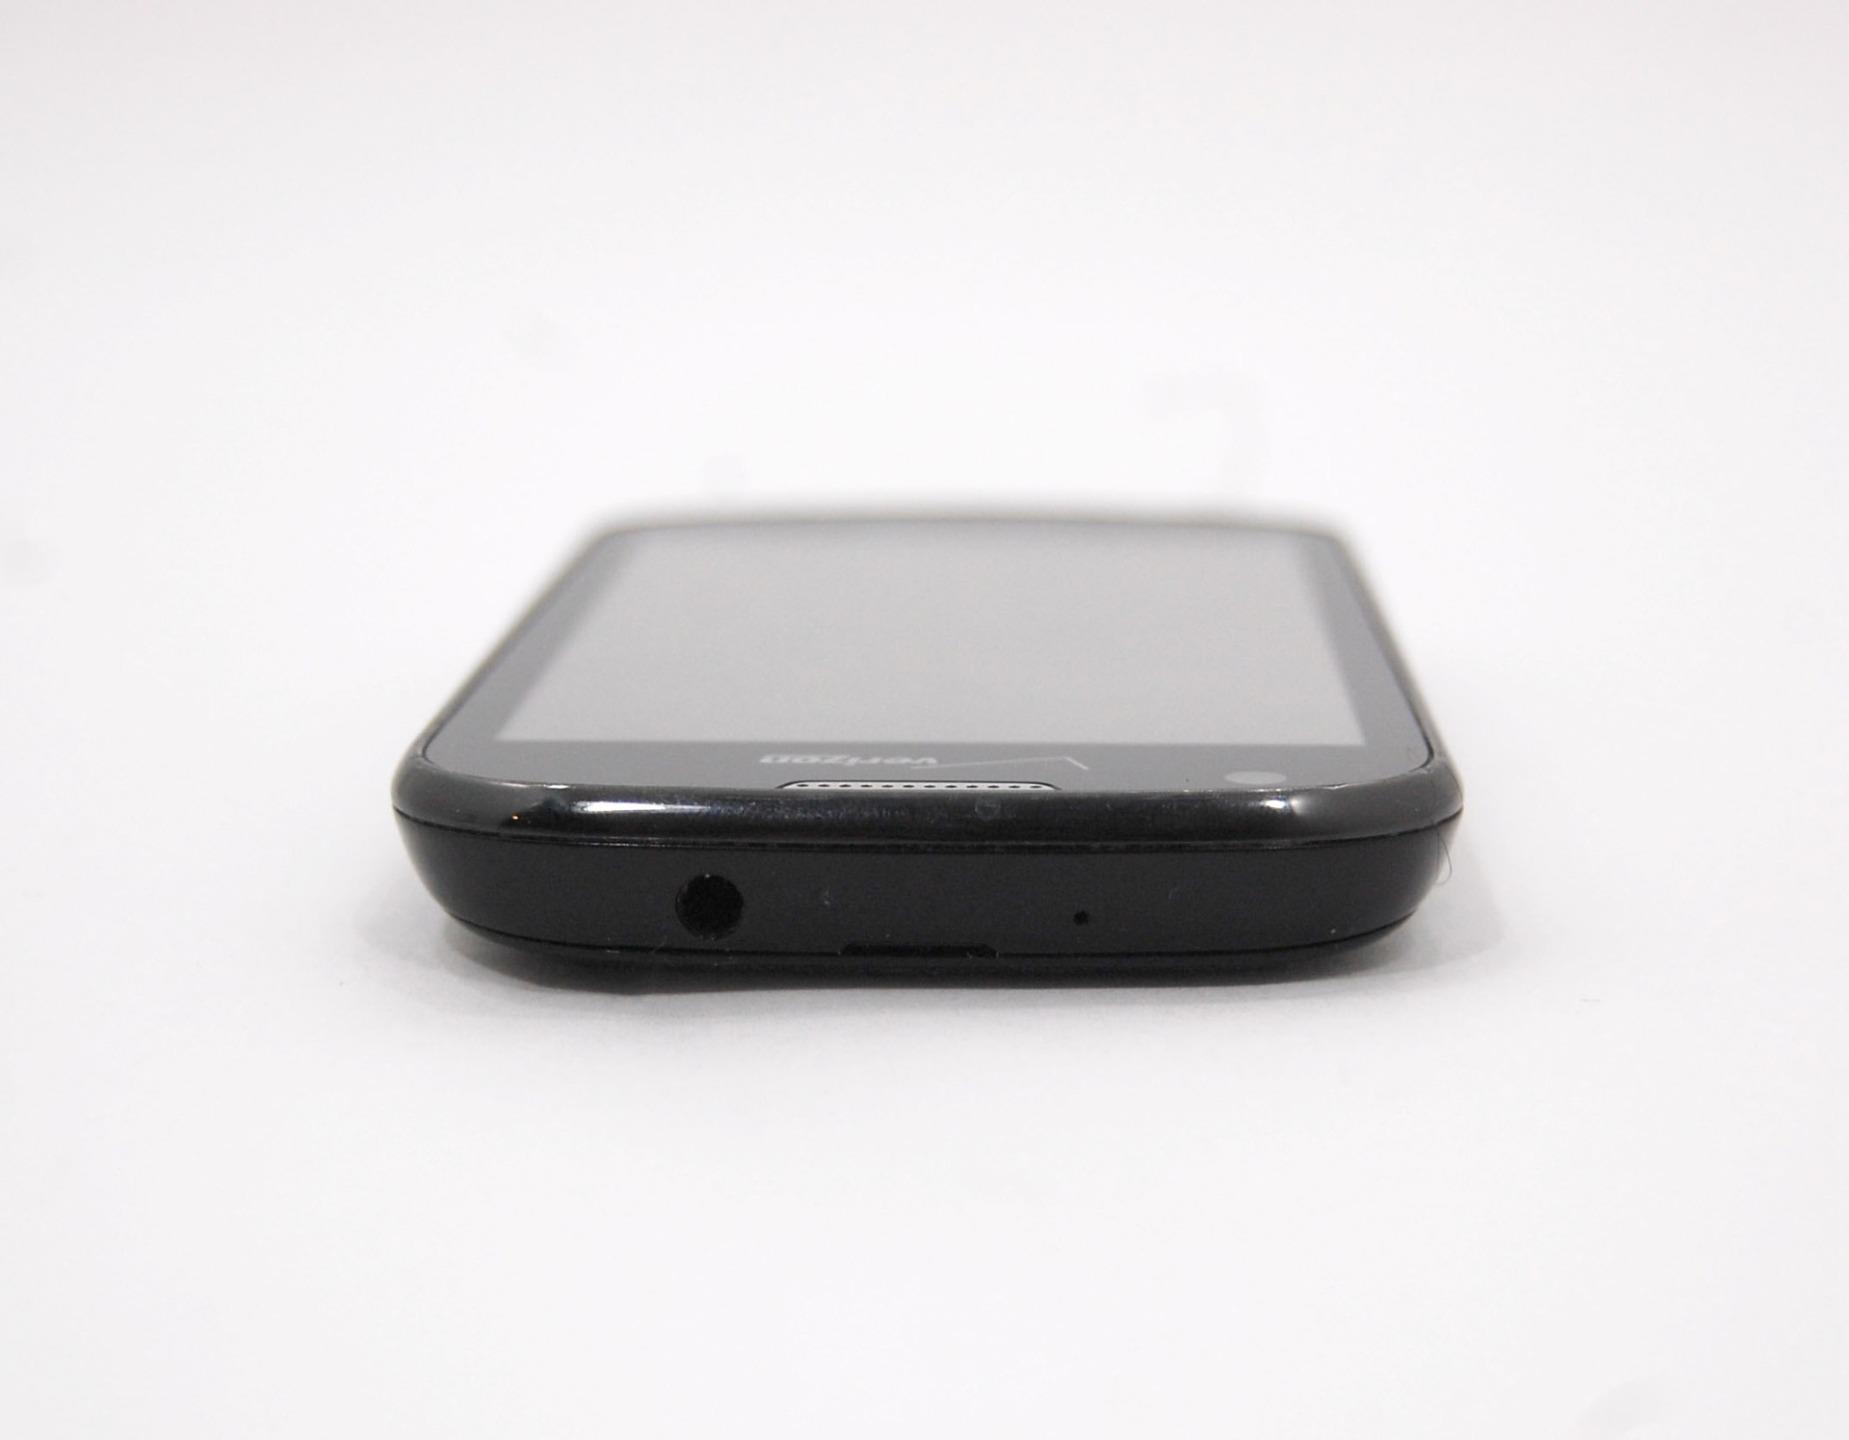 Samsung-Galaxy-Stellar-SCH-I200-4GB-4G-LTE-Android-Black-Smartphone-Verizon thumbnail 5